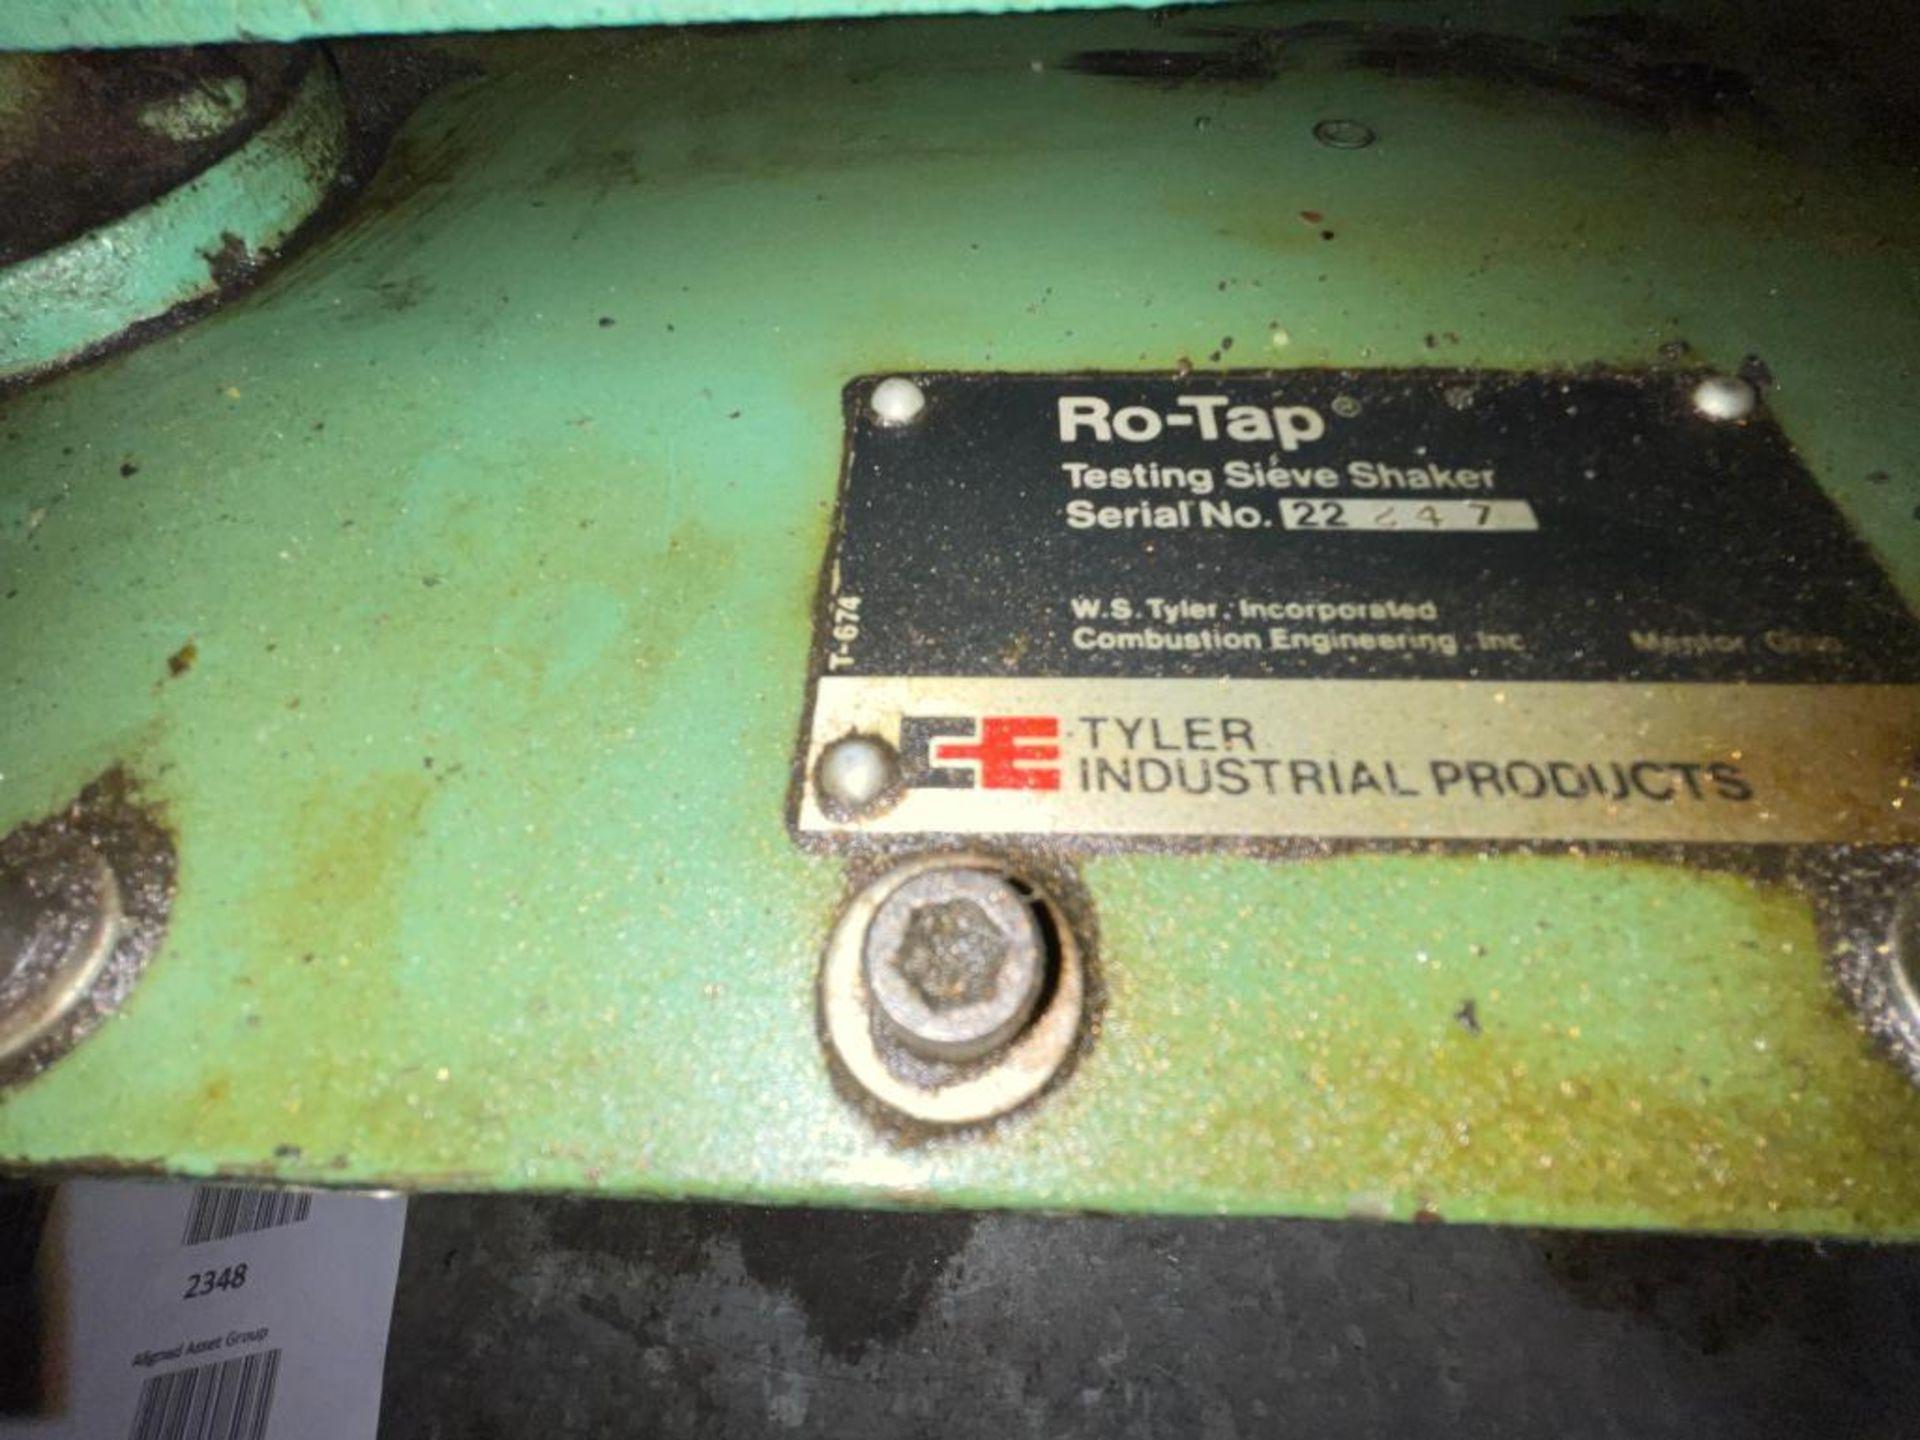 Ro-Tap testing sieve shaker - Image 3 of 8